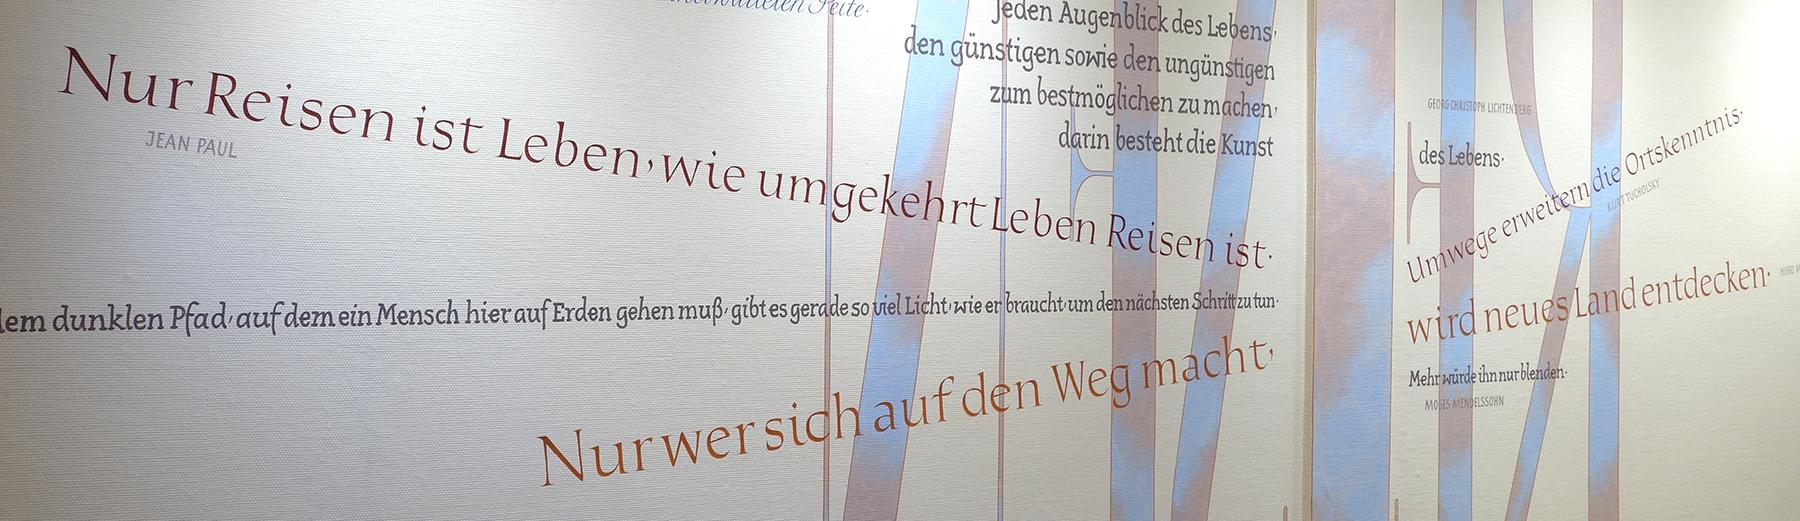 Kalligrafie propfe wandkalligrafie seniorenheim - Jugendstil wandgestaltung ...